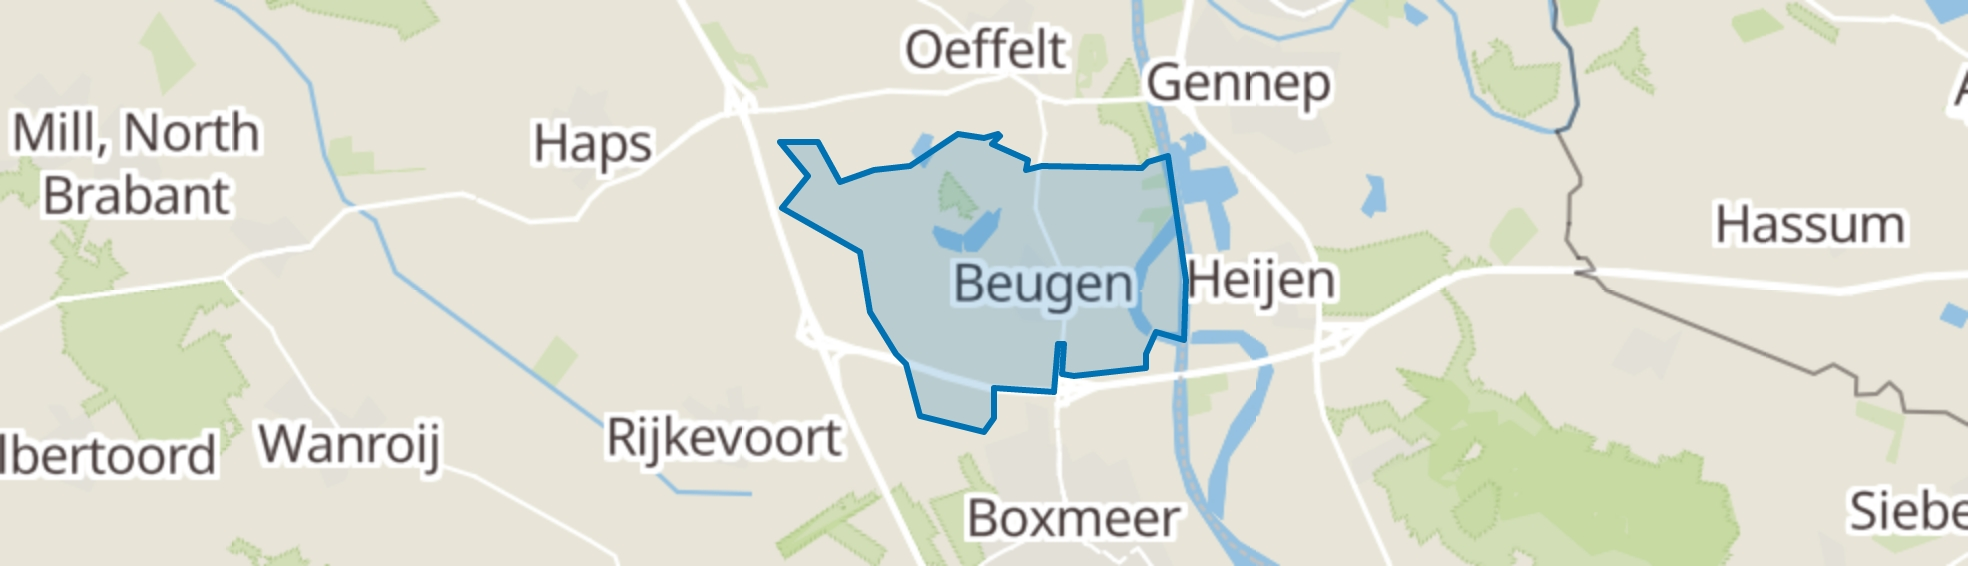 Beugen map